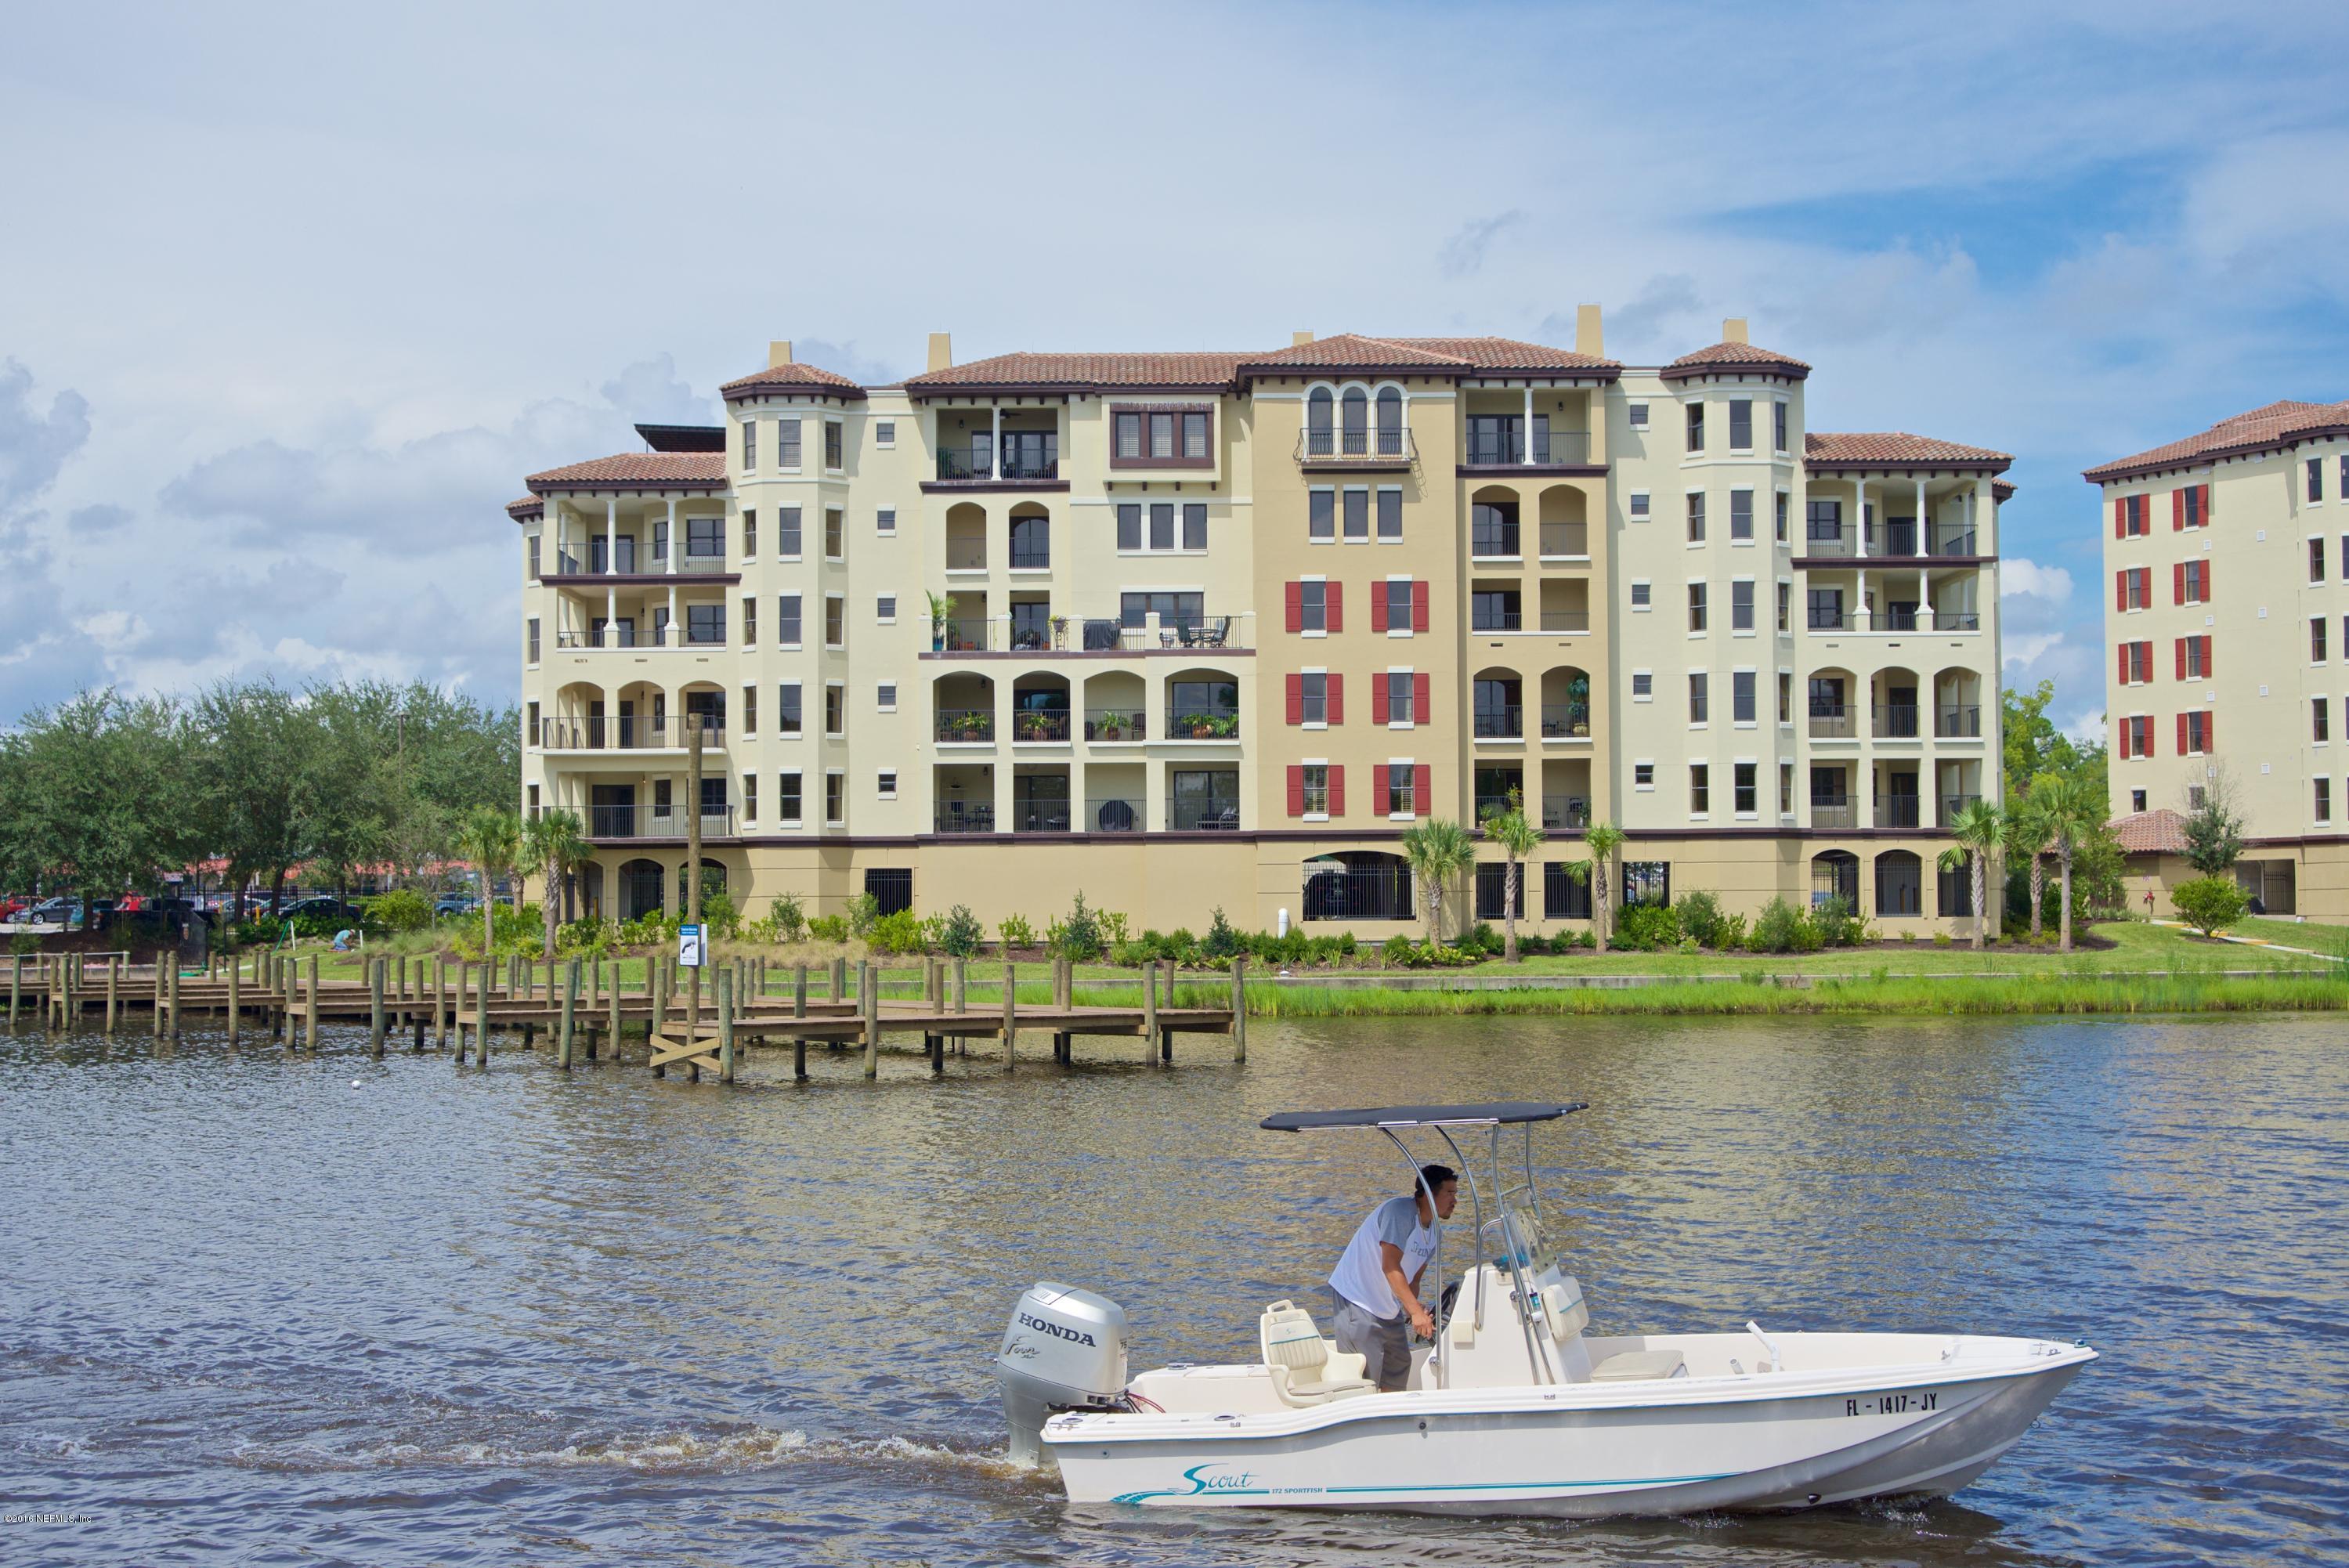 3958 BAYMEADOWS, JACKSONVILLE, FLORIDA 32217, 4 Bedrooms Bedrooms, ,3 BathroomsBathrooms,Residential,For sale,BAYMEADOWS,1051766